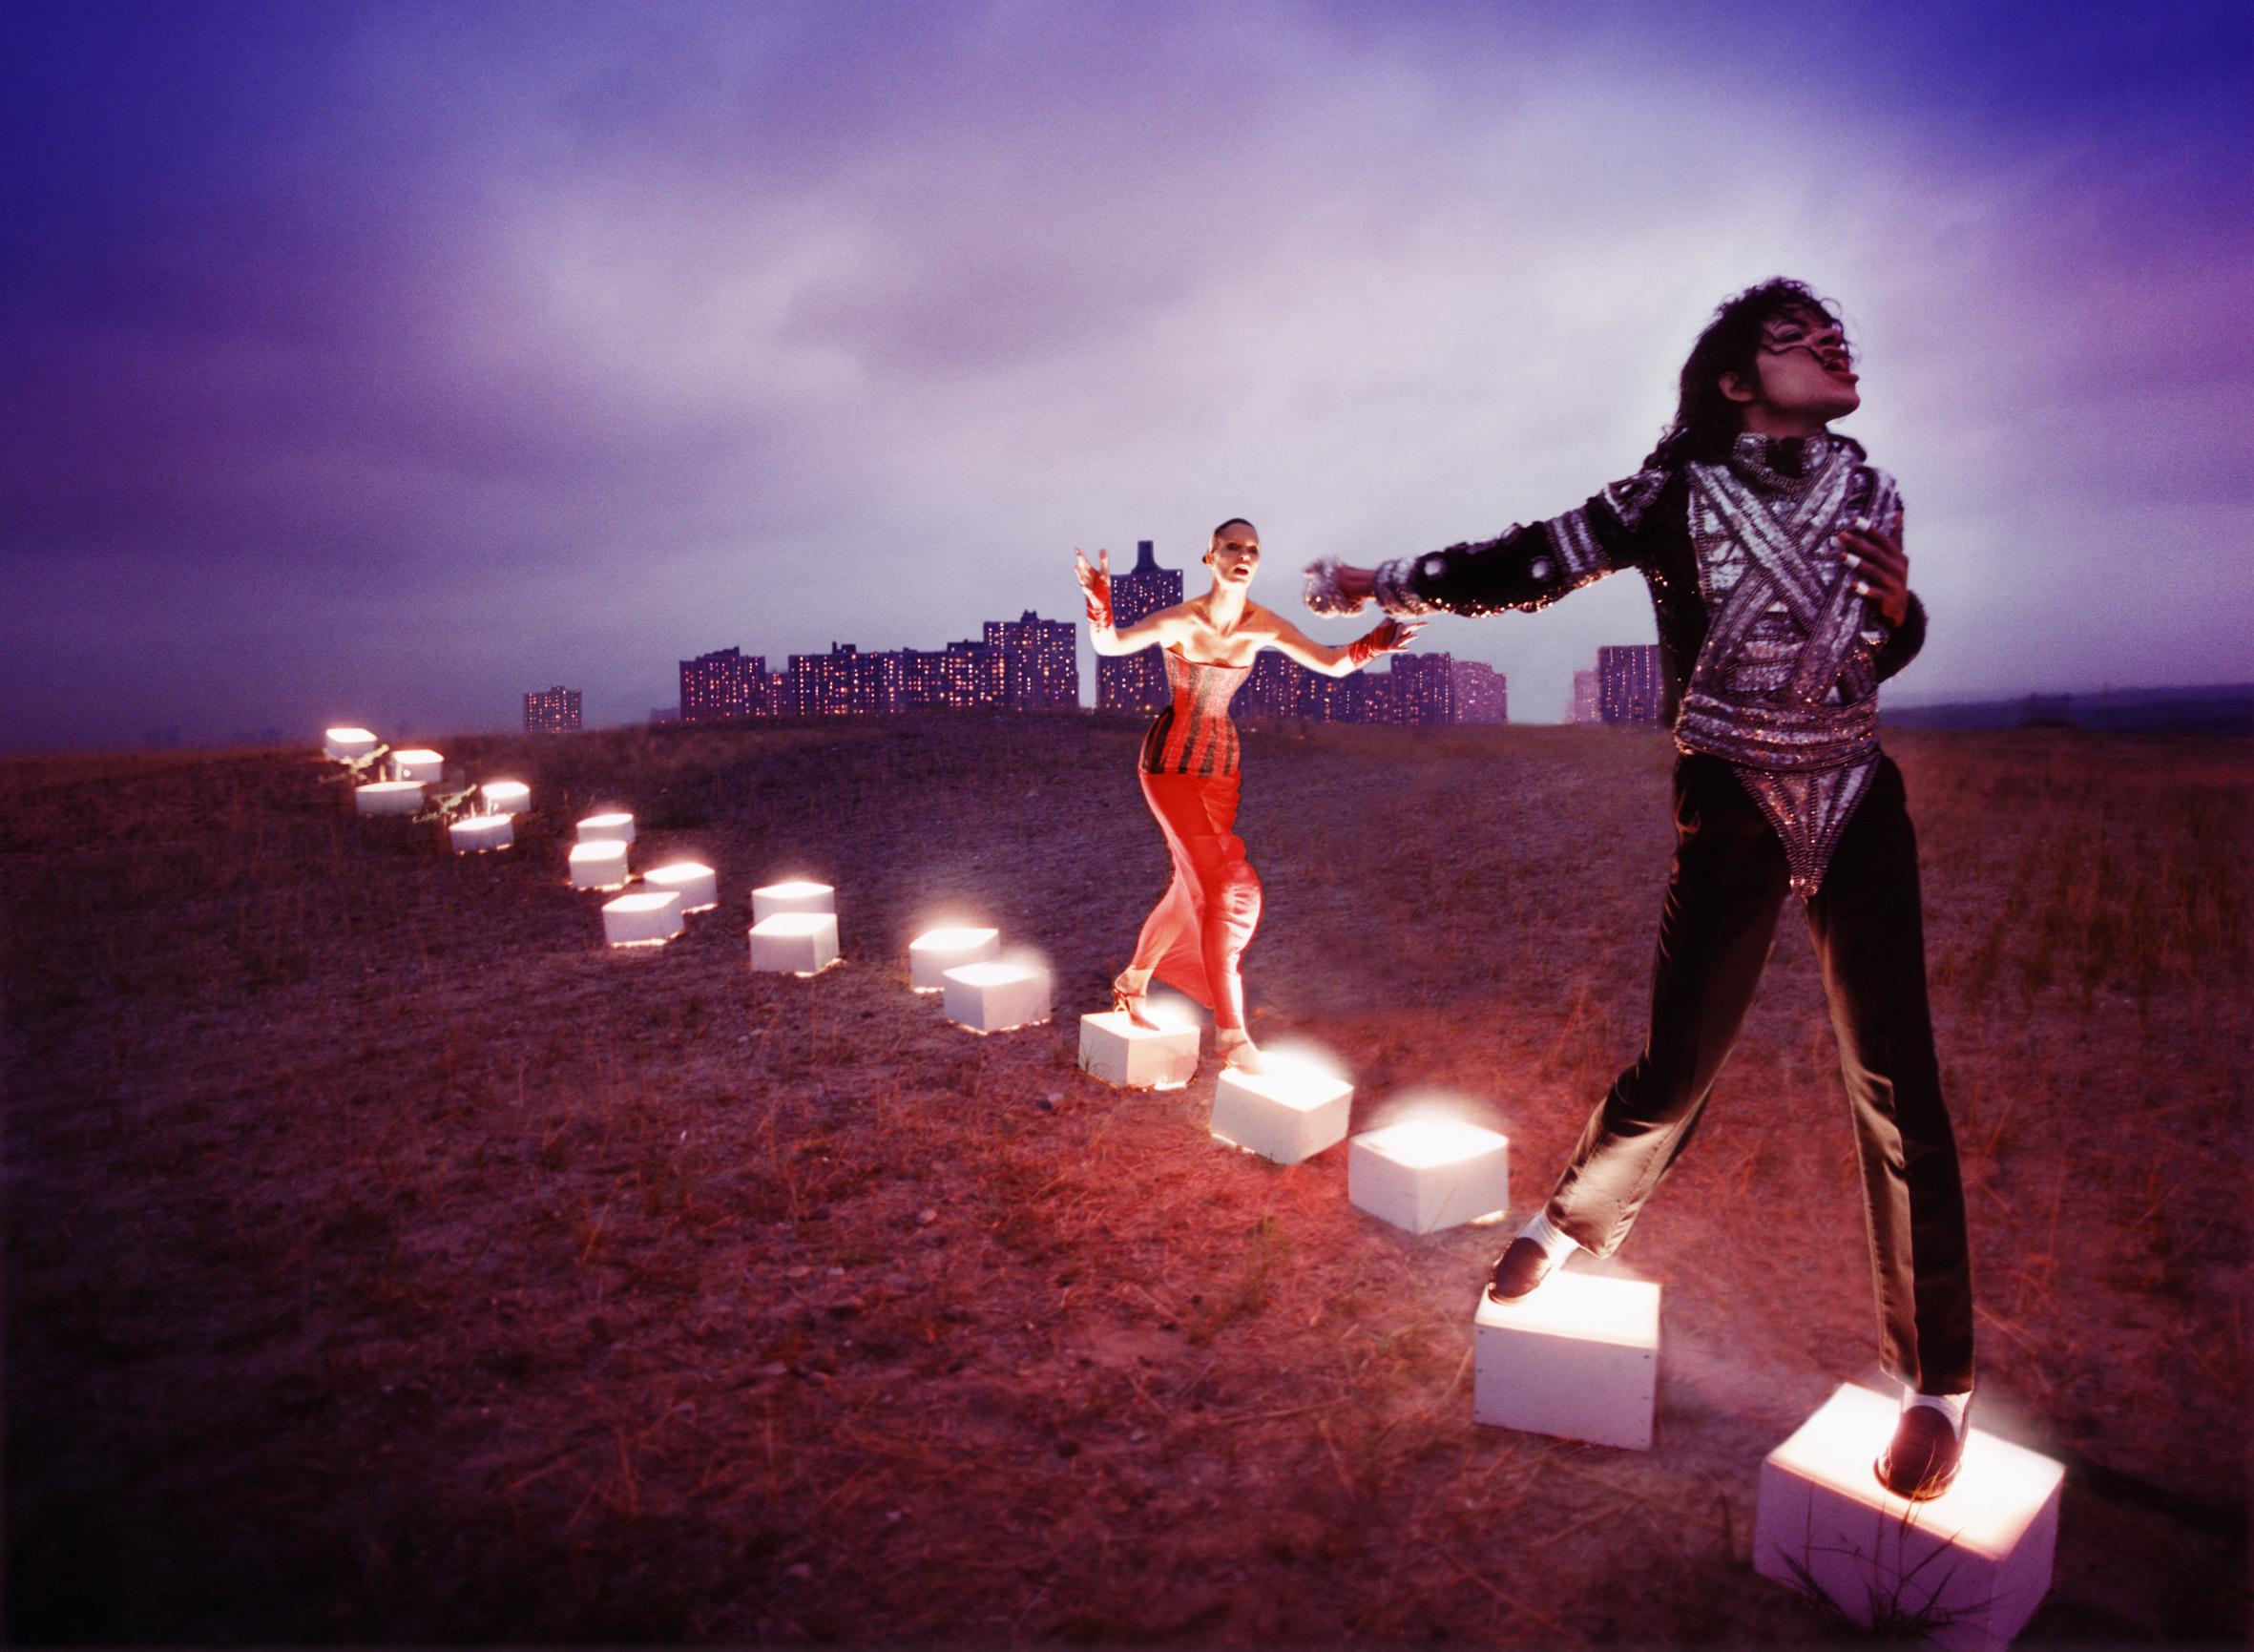 an_illuminating_path_by_david_lachapelle.jpg